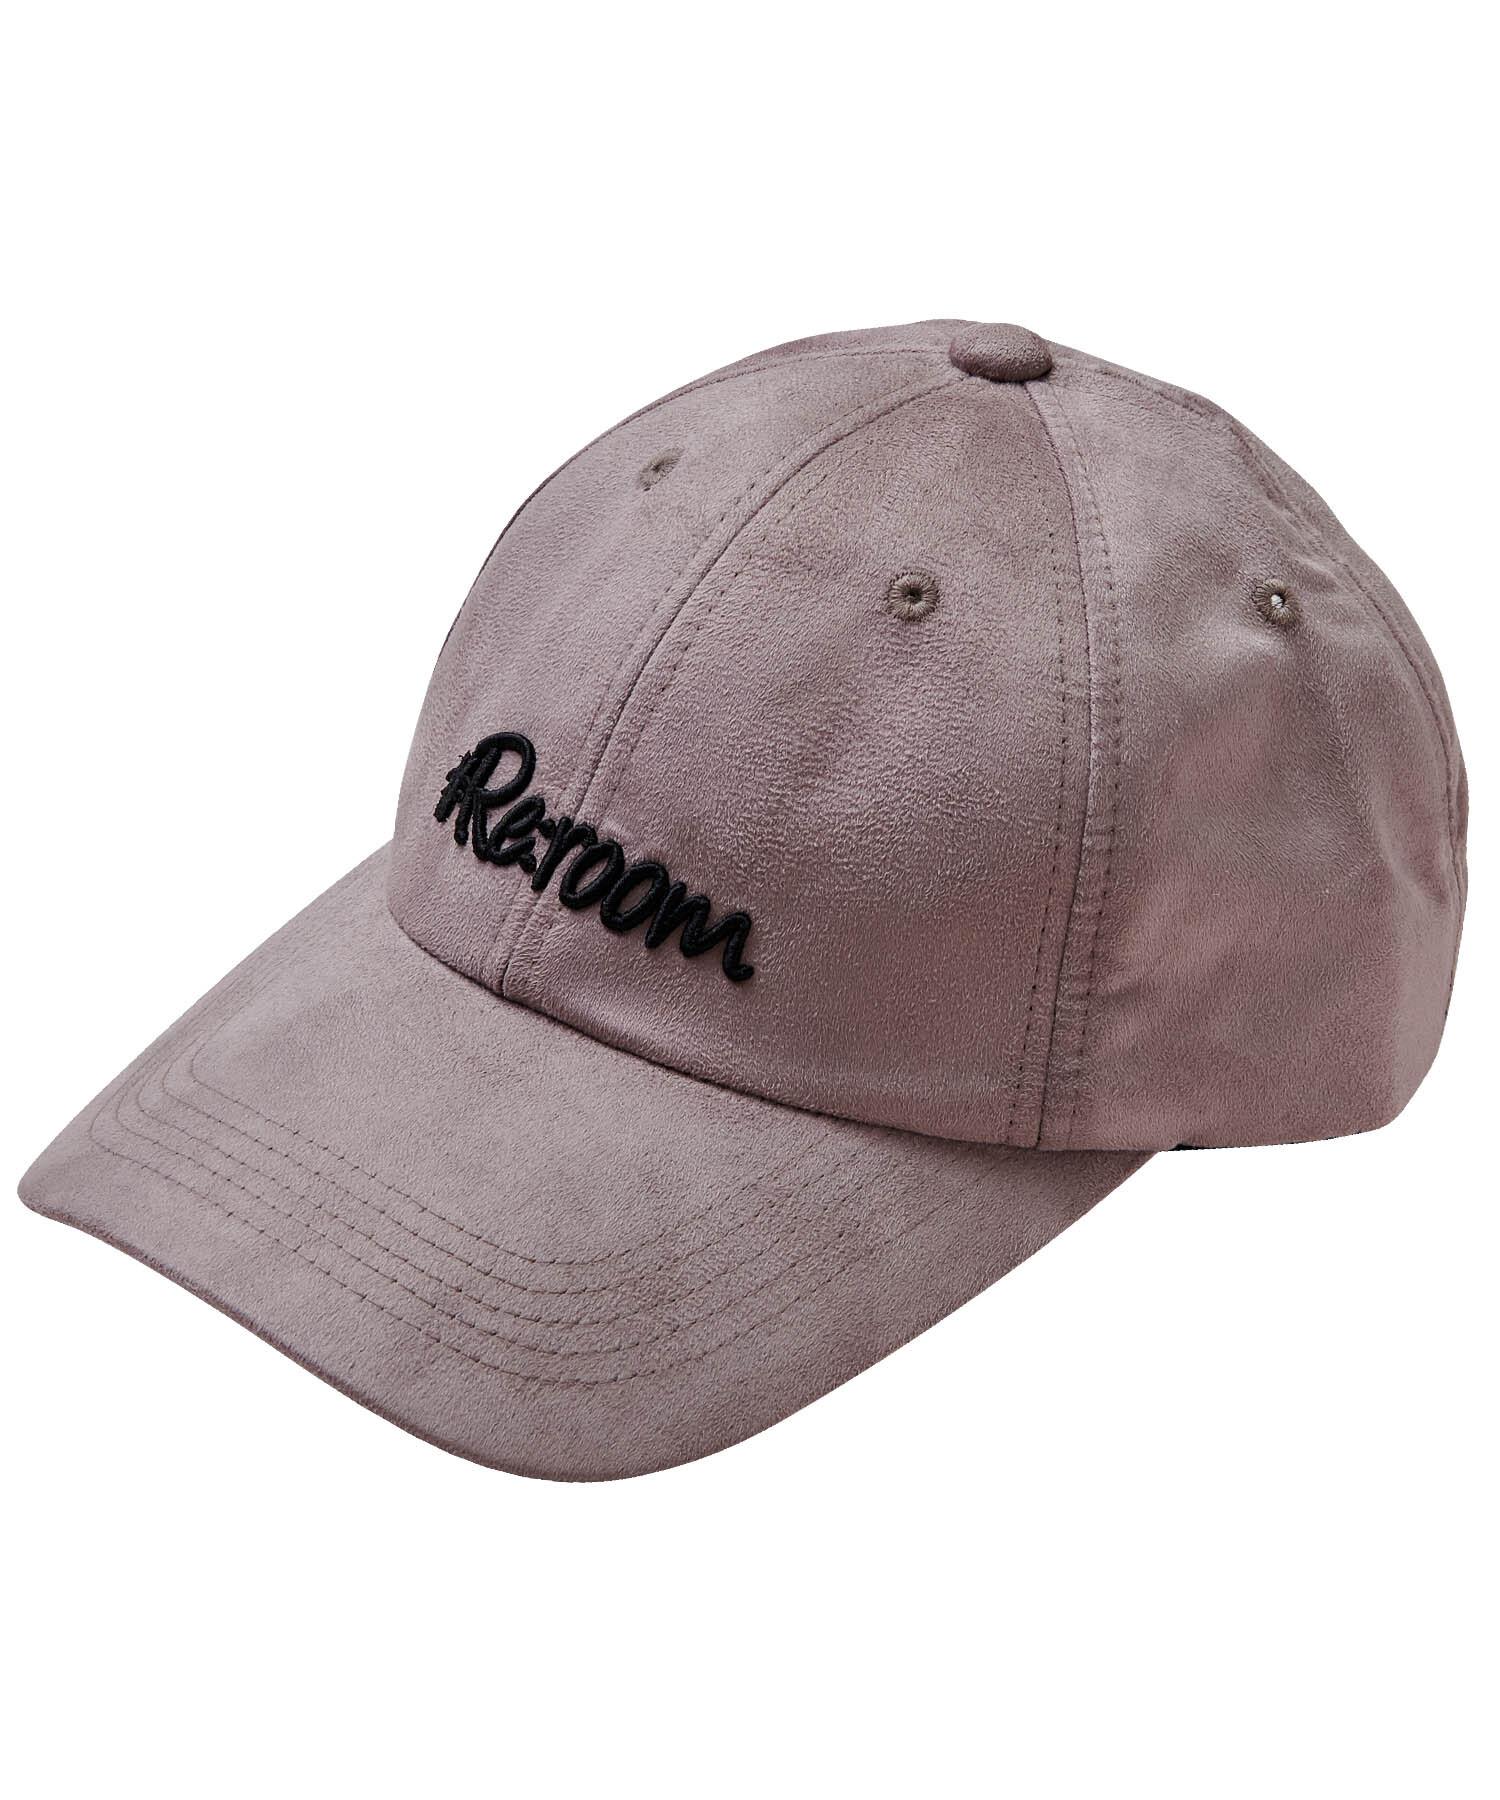 3D LOGO SUEDE CAP[REH095]